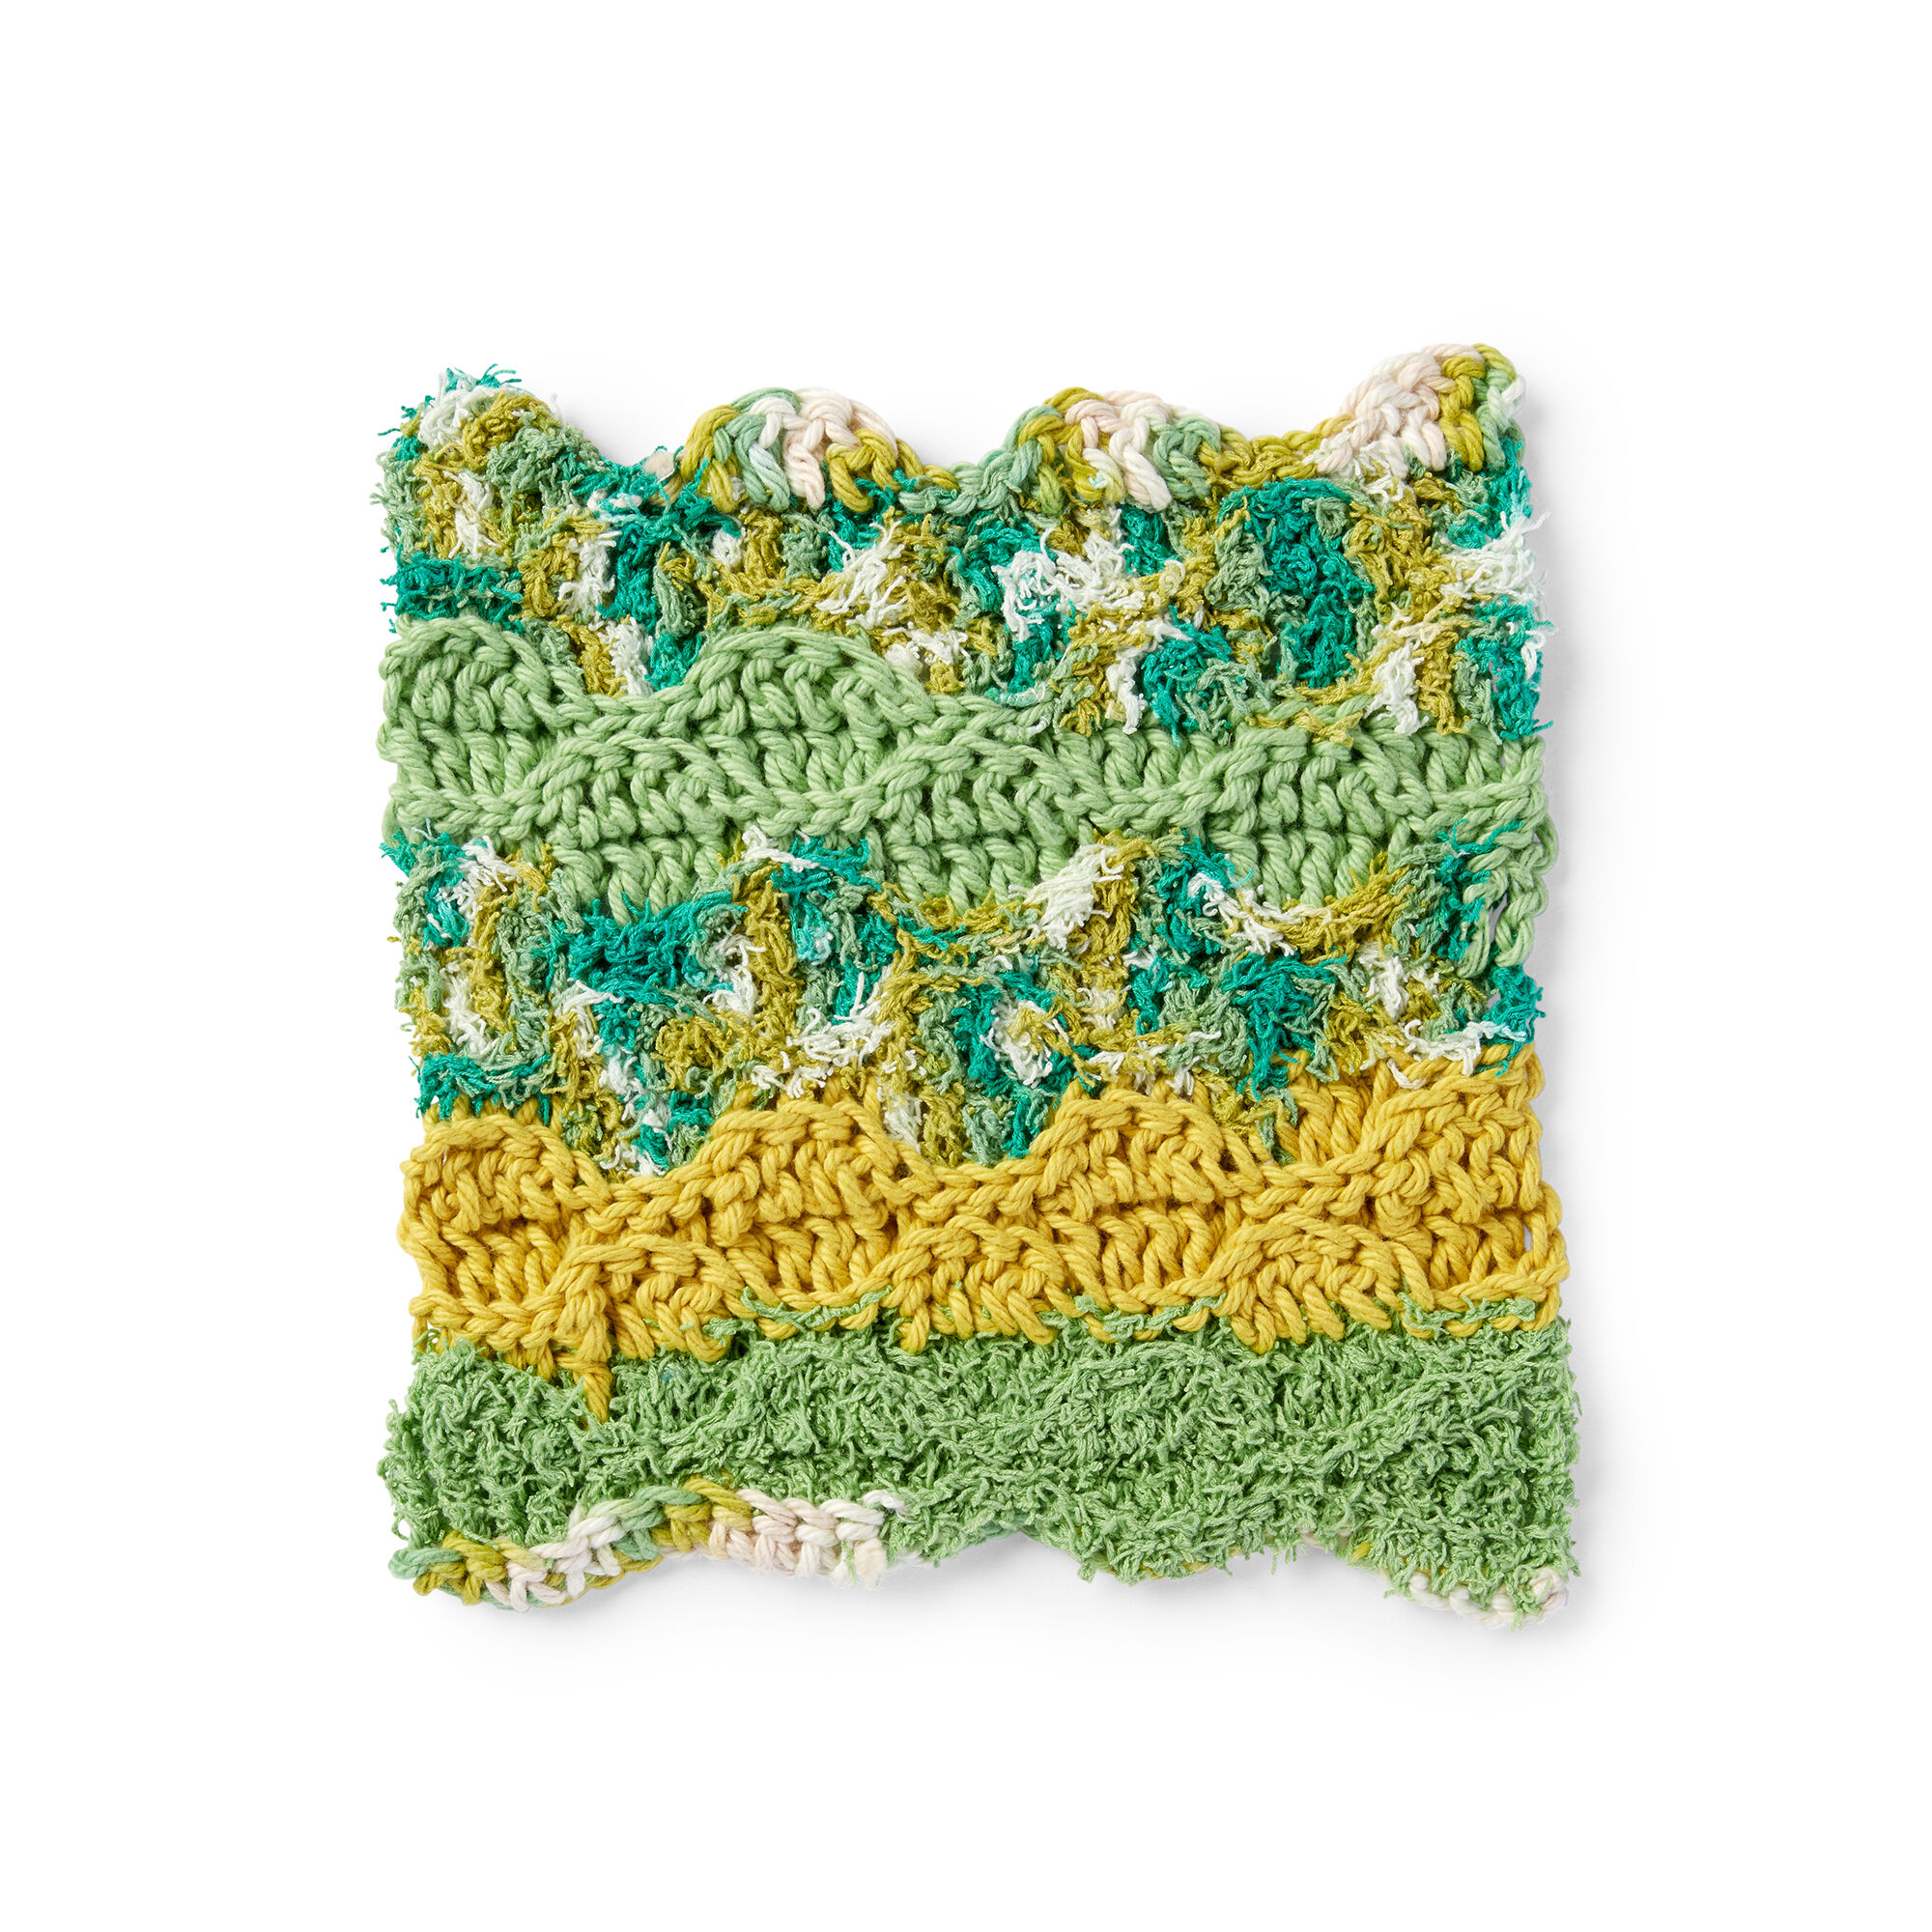 Lily Sugar N Cream Rippling Wave Crochet Dishcloth Pattern Yarnspirations